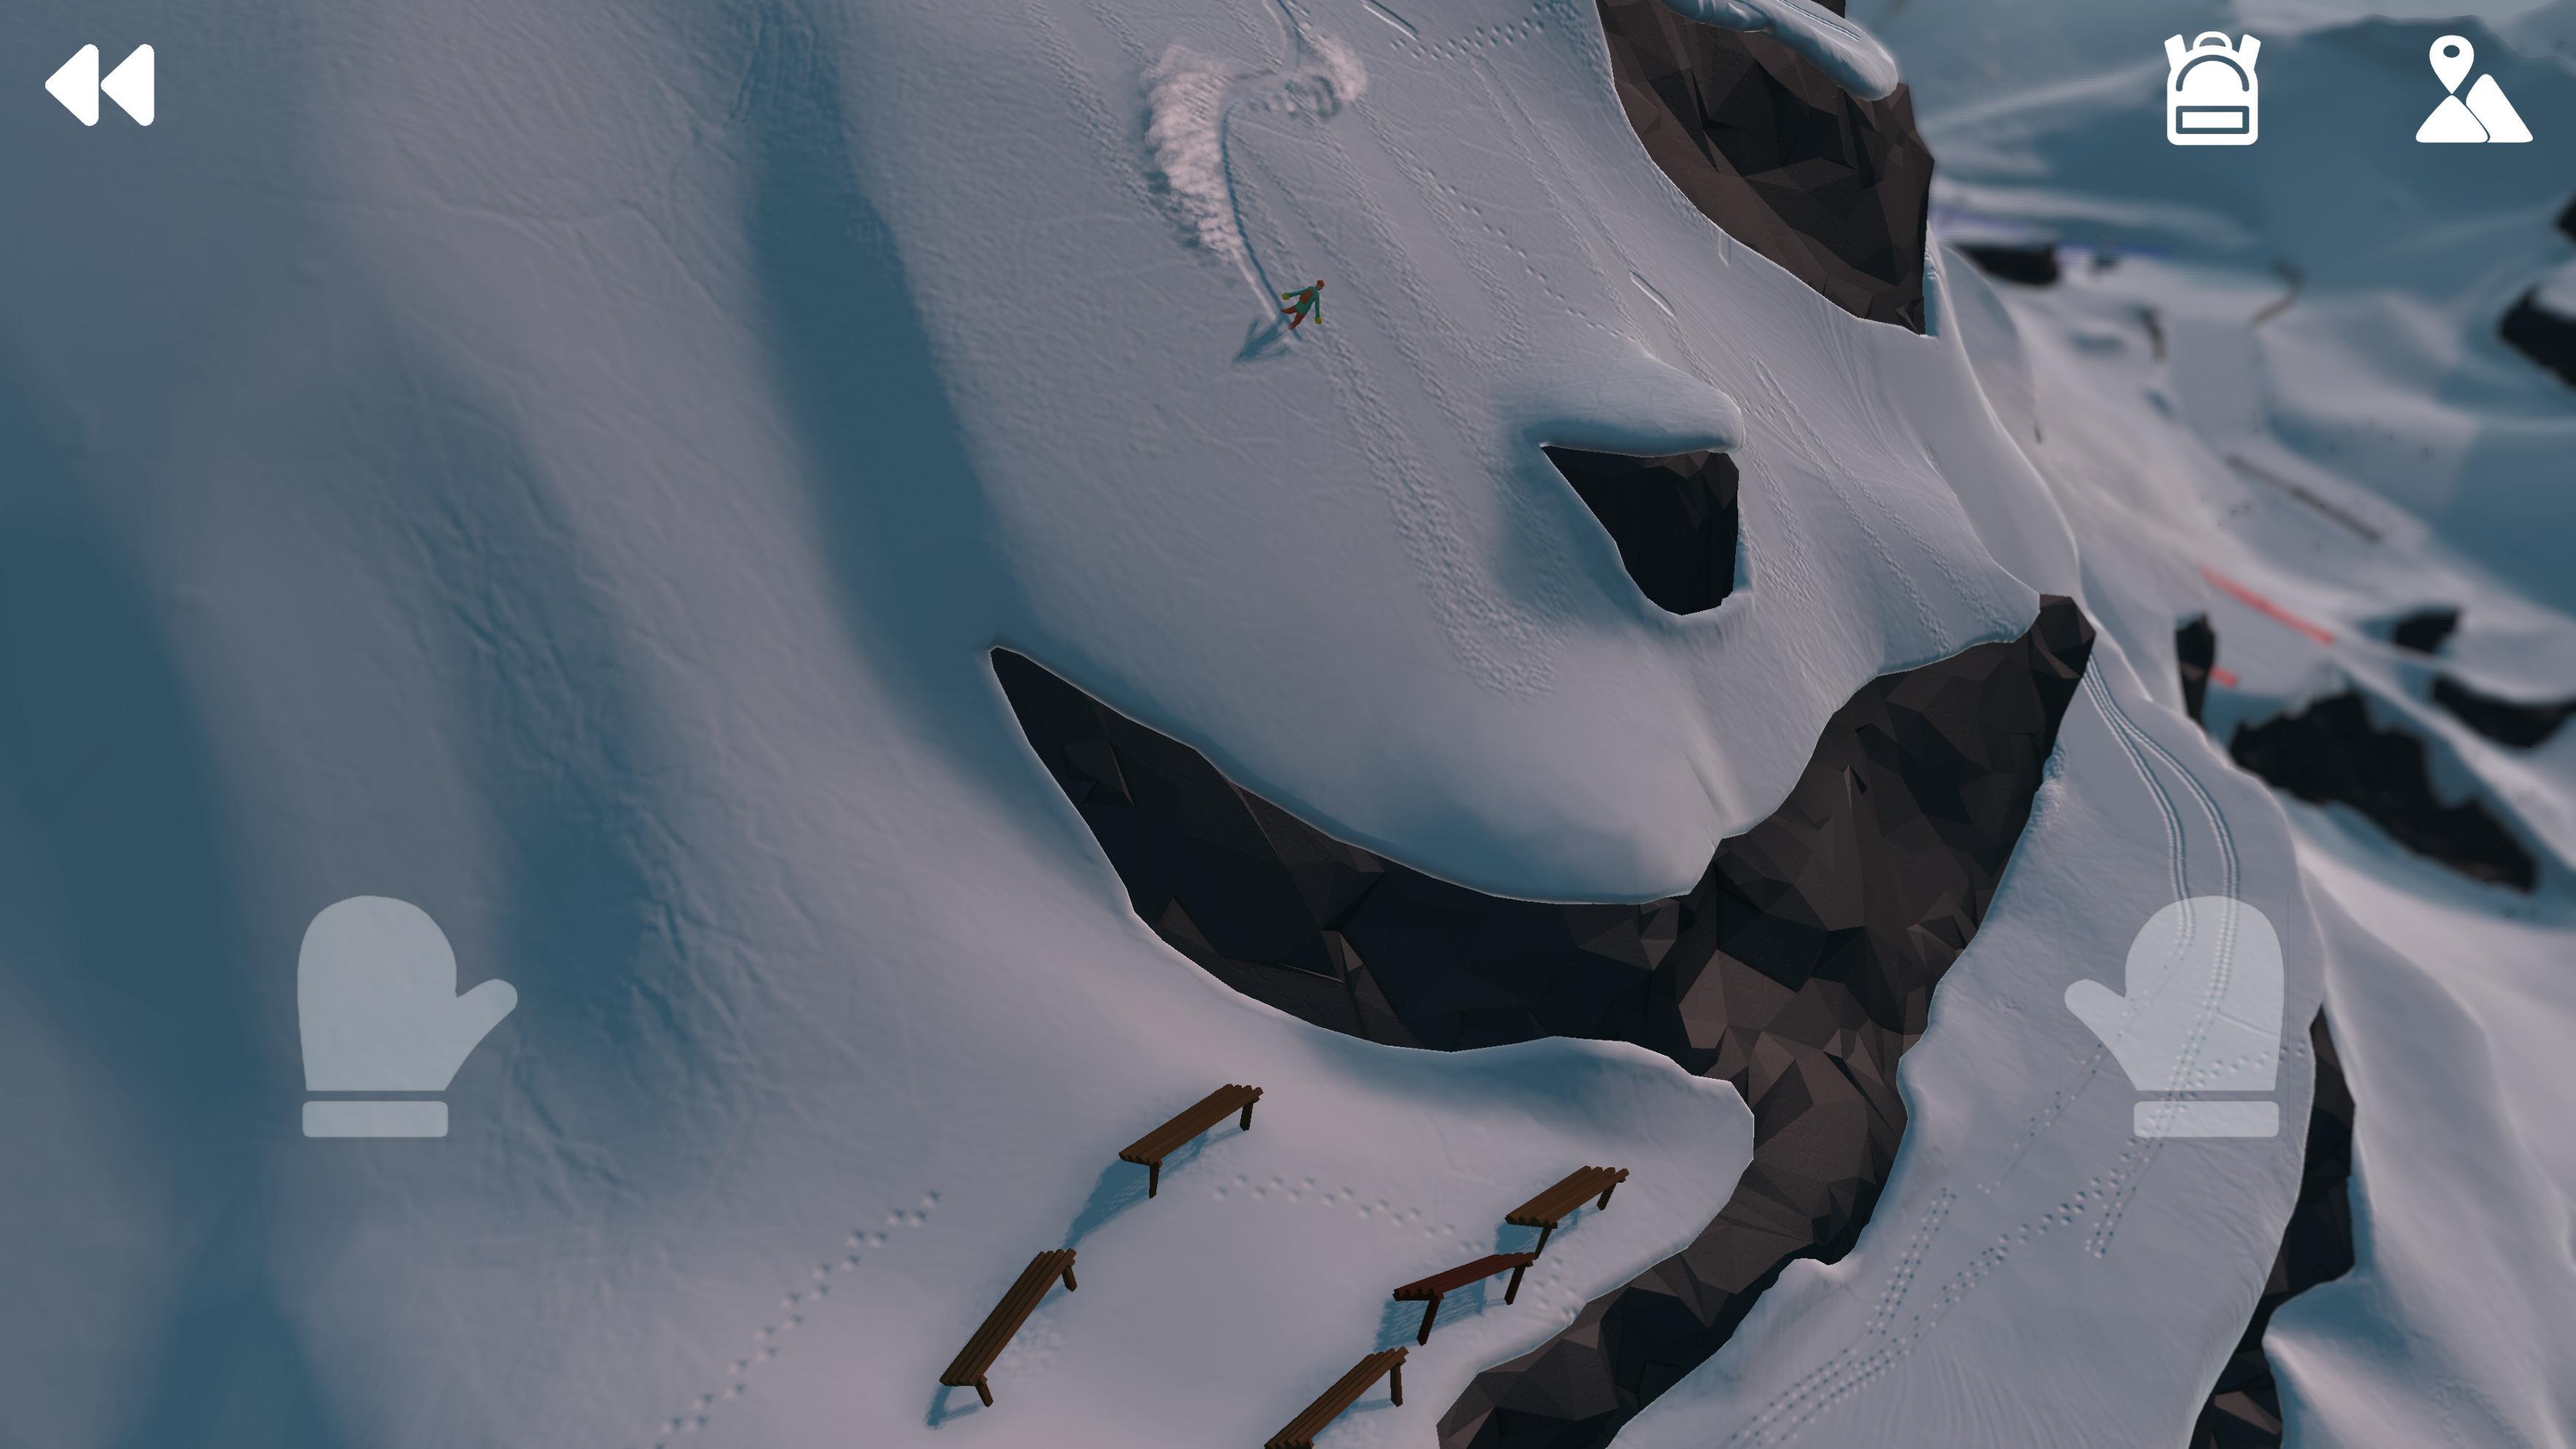 Grand Mountain Adventure: Snowboard Premiere 1.036 Screenshot 1